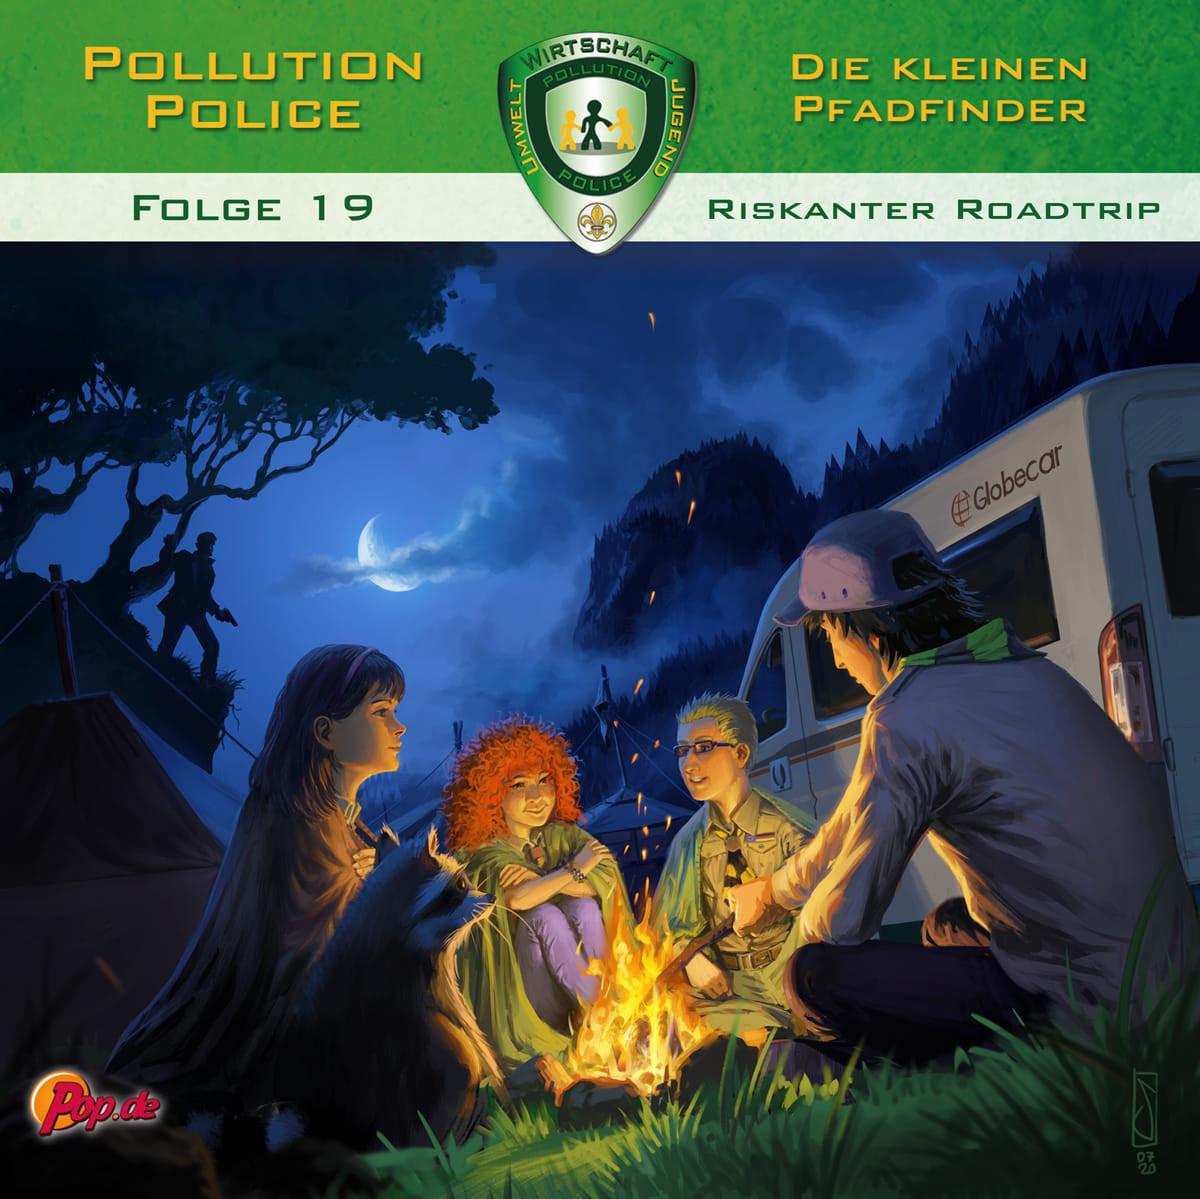 Pollution Police - Folge 19 : Riskanter Roadtrip